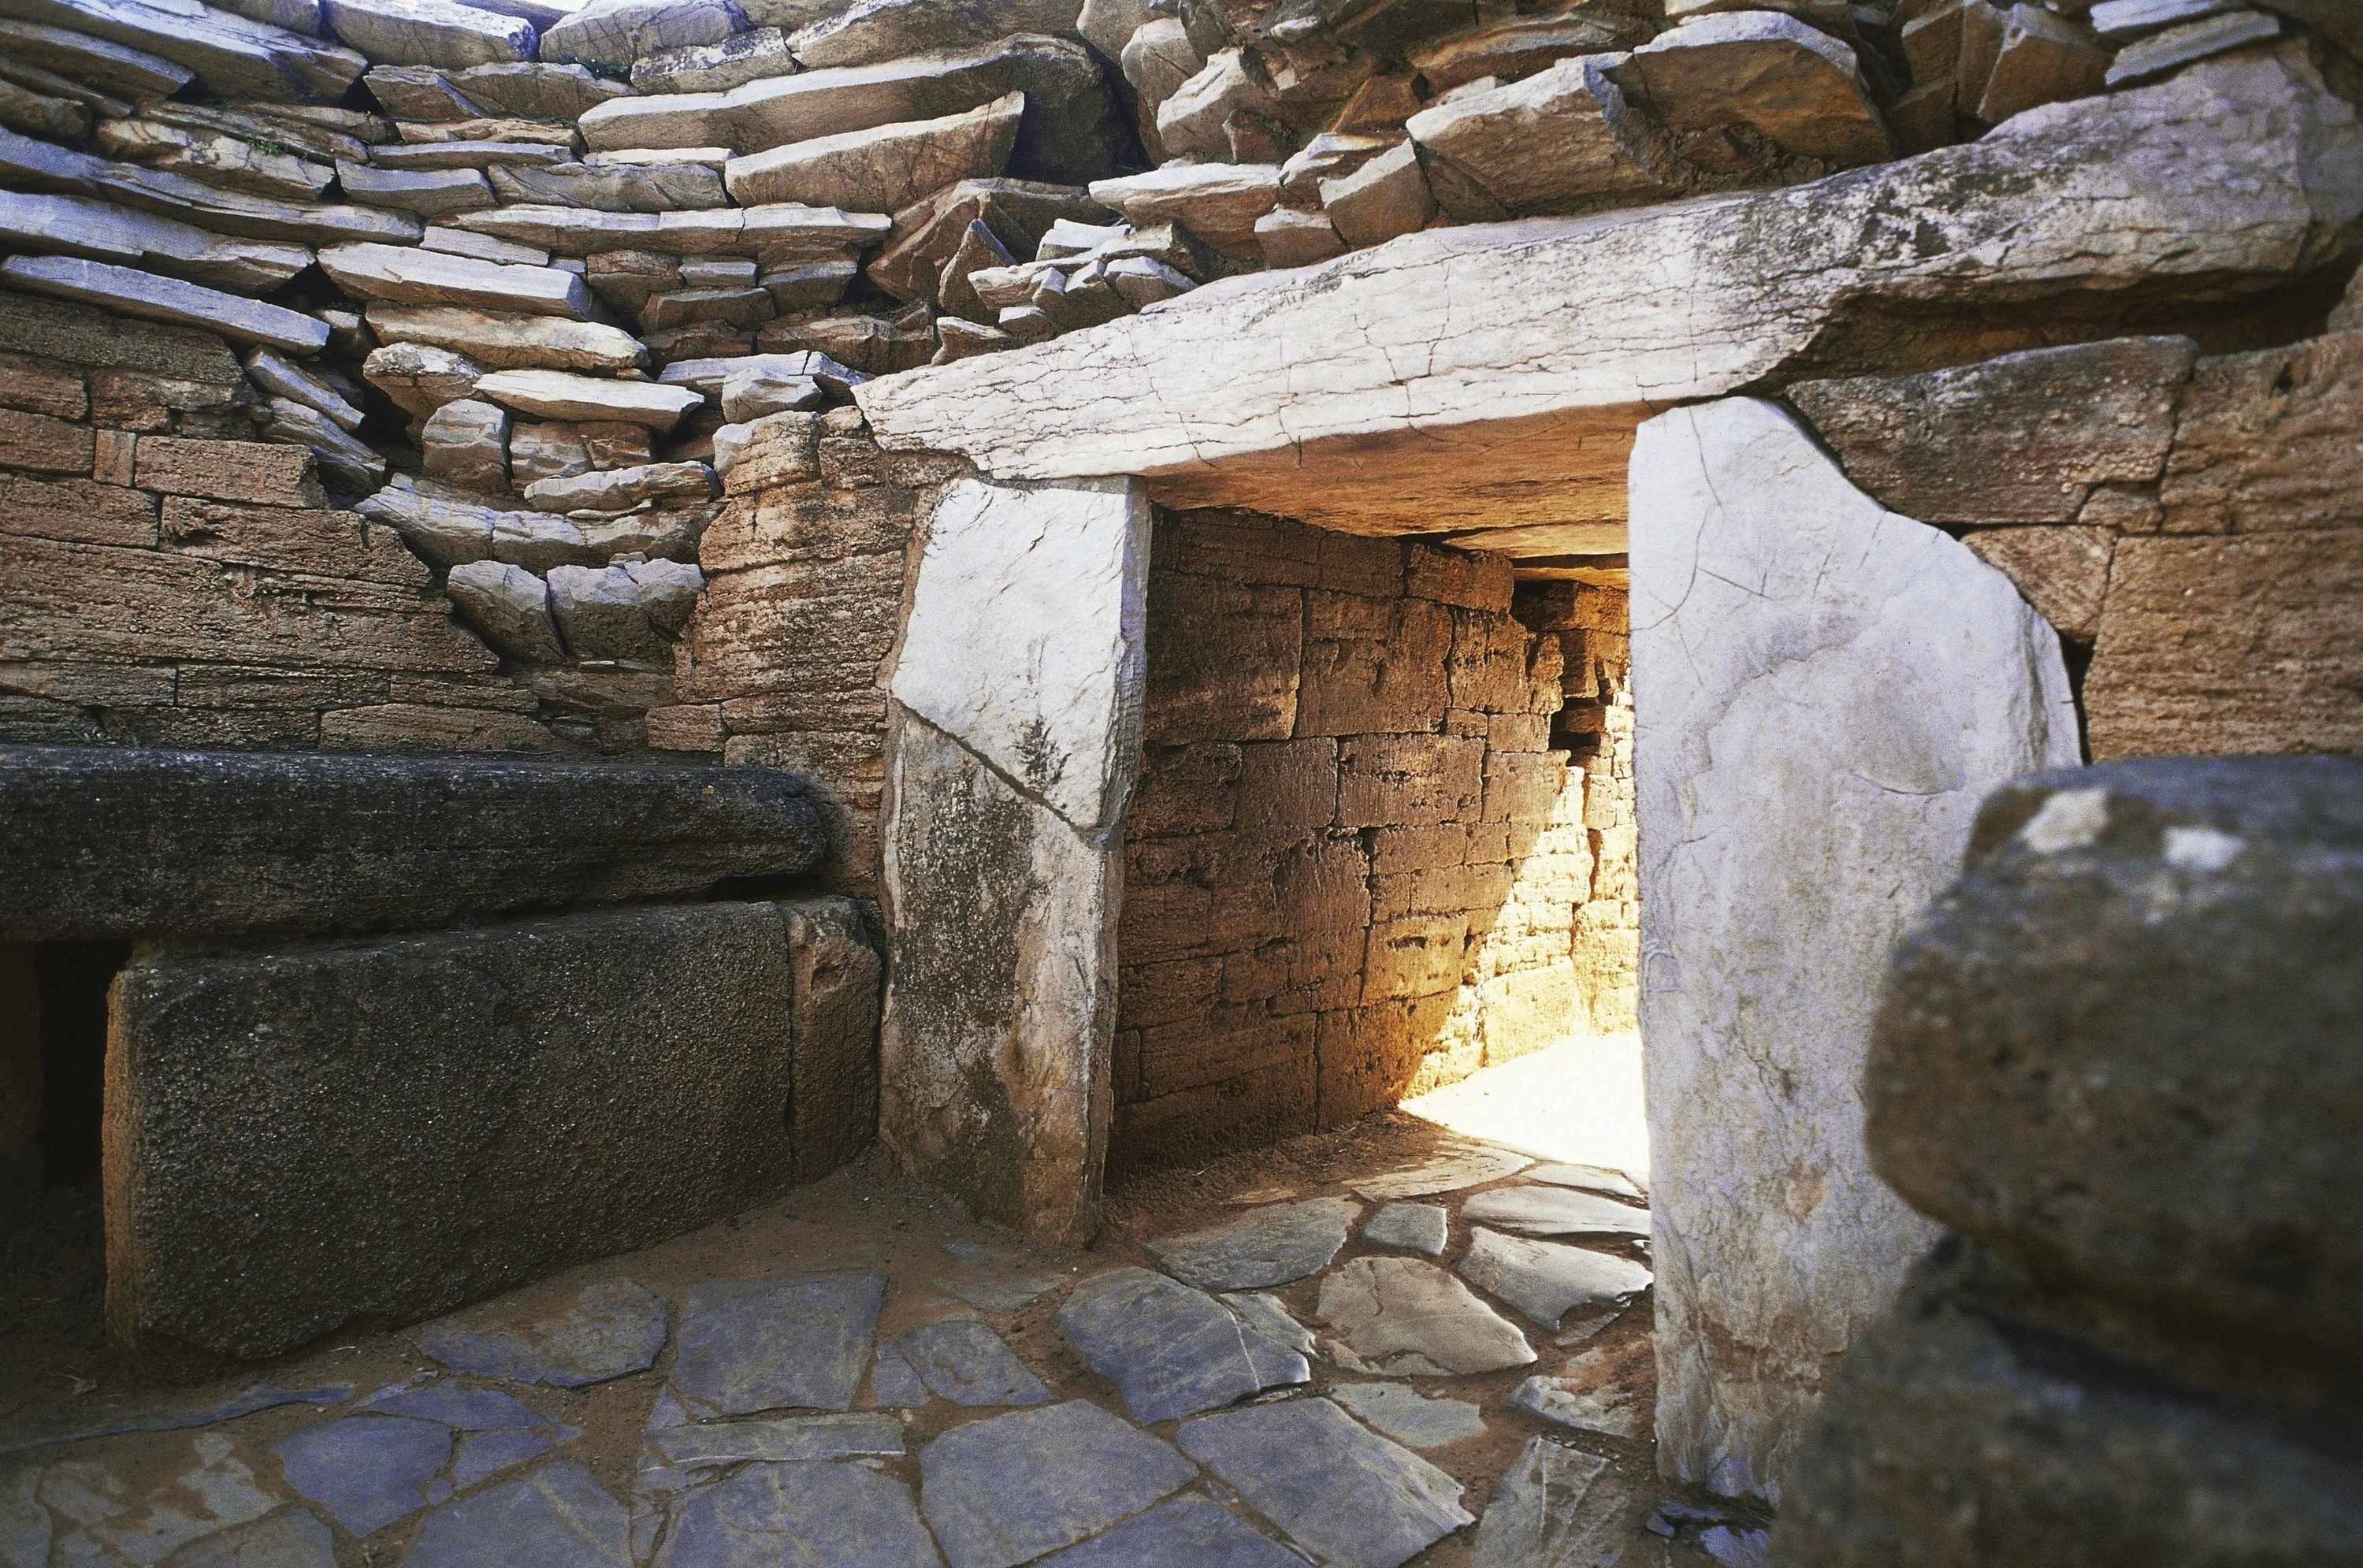 Nécropole étrusque de Populonia